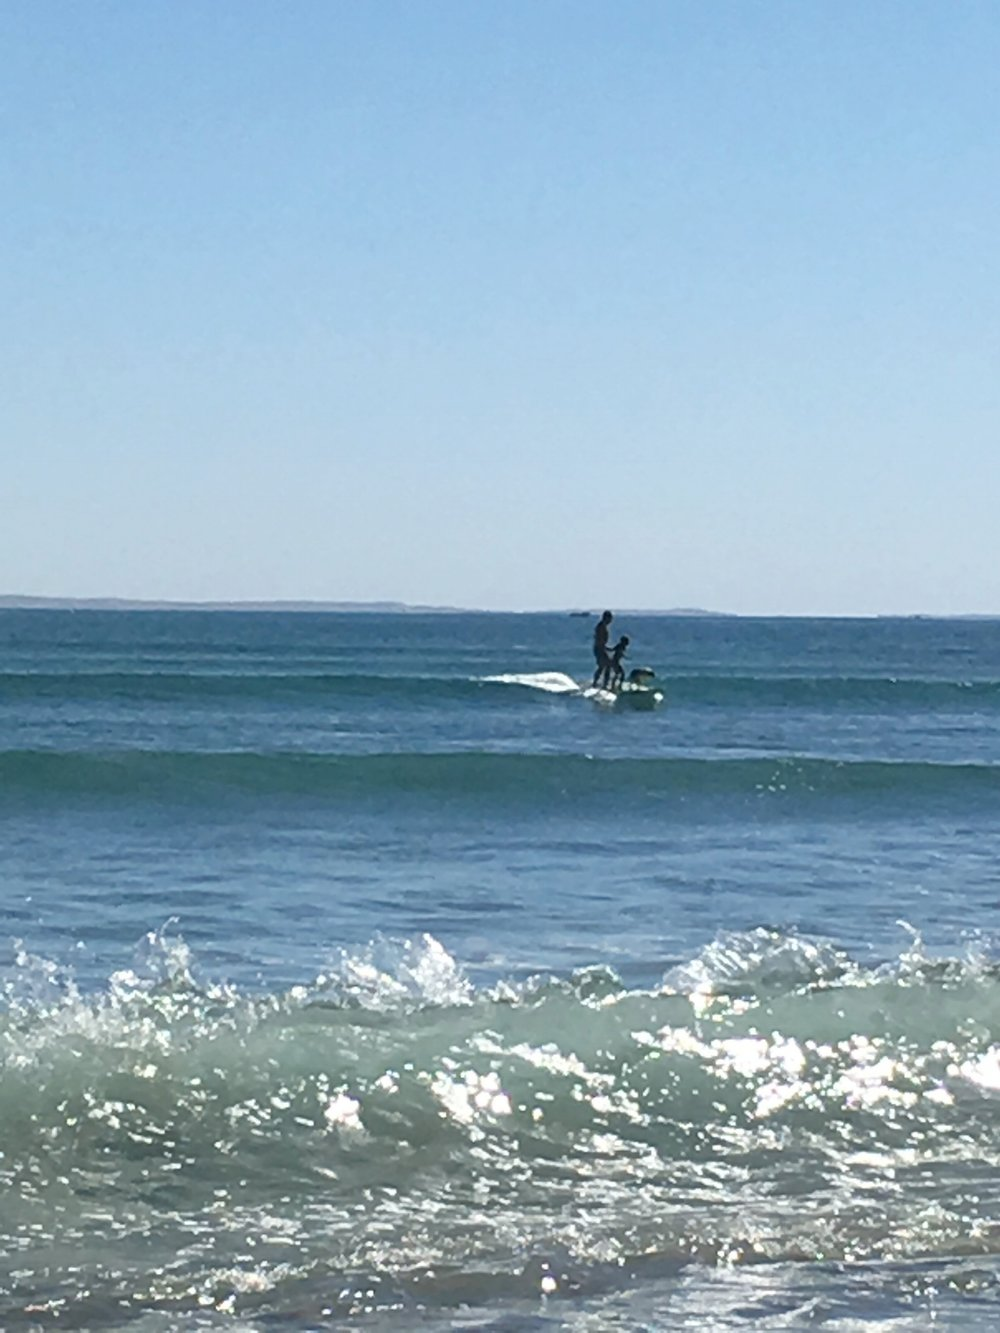 Surfing at Scorpion Bay